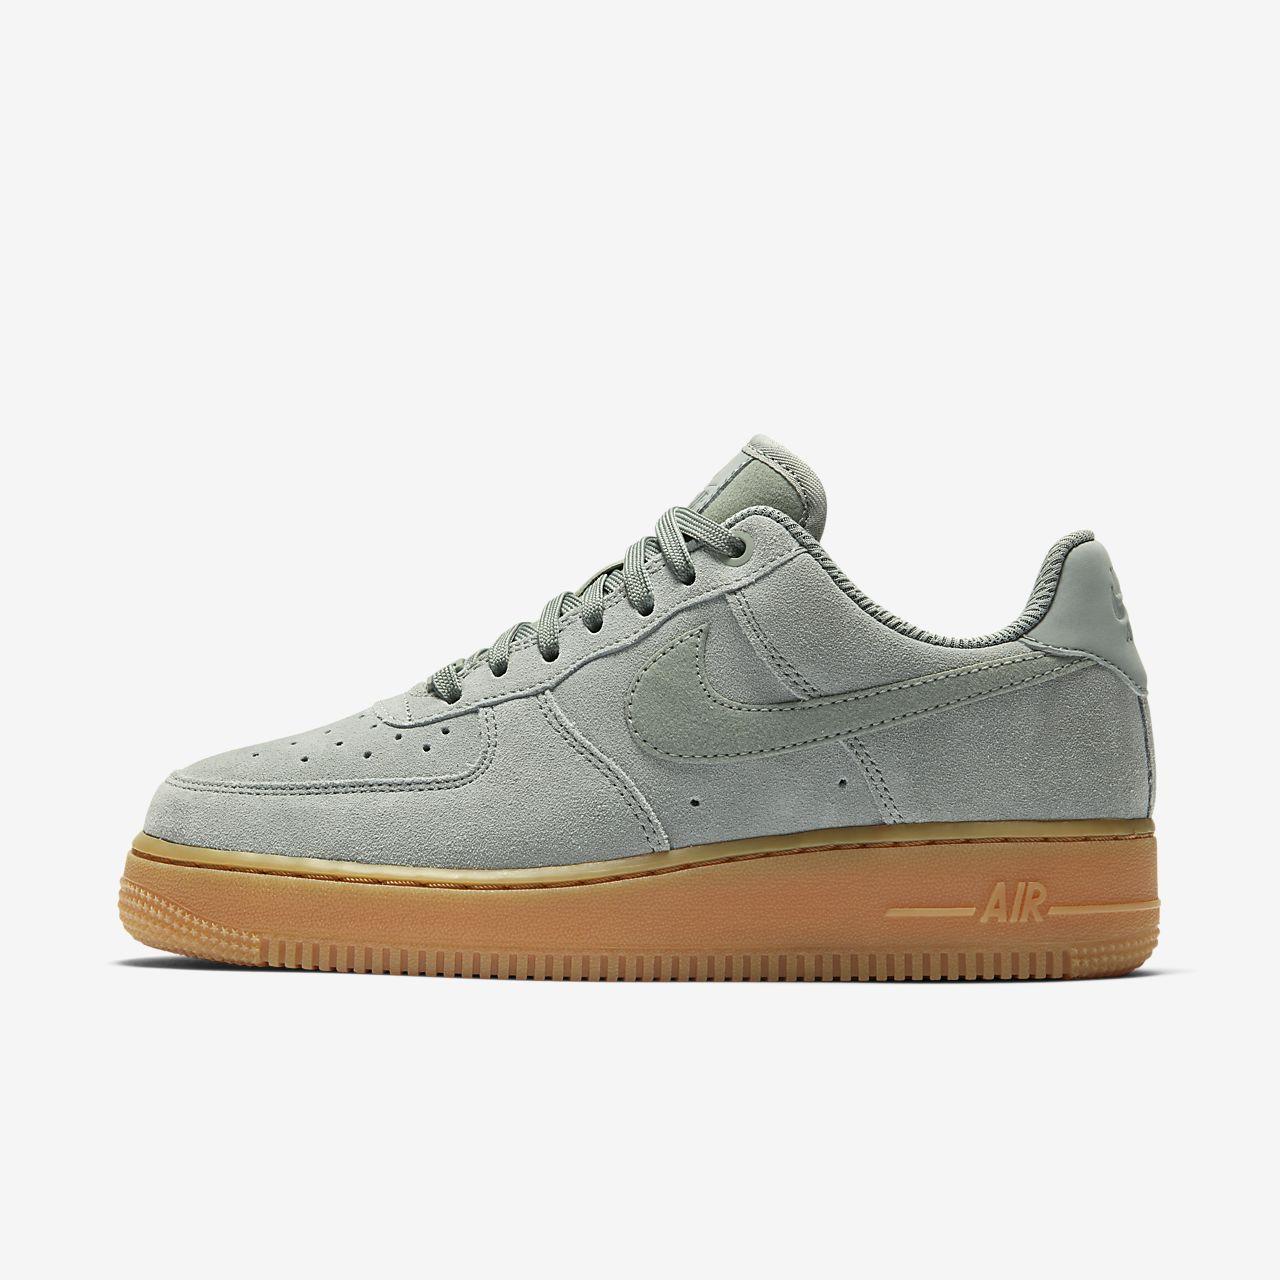 2nike air force 1 07 se - mujer zapatos